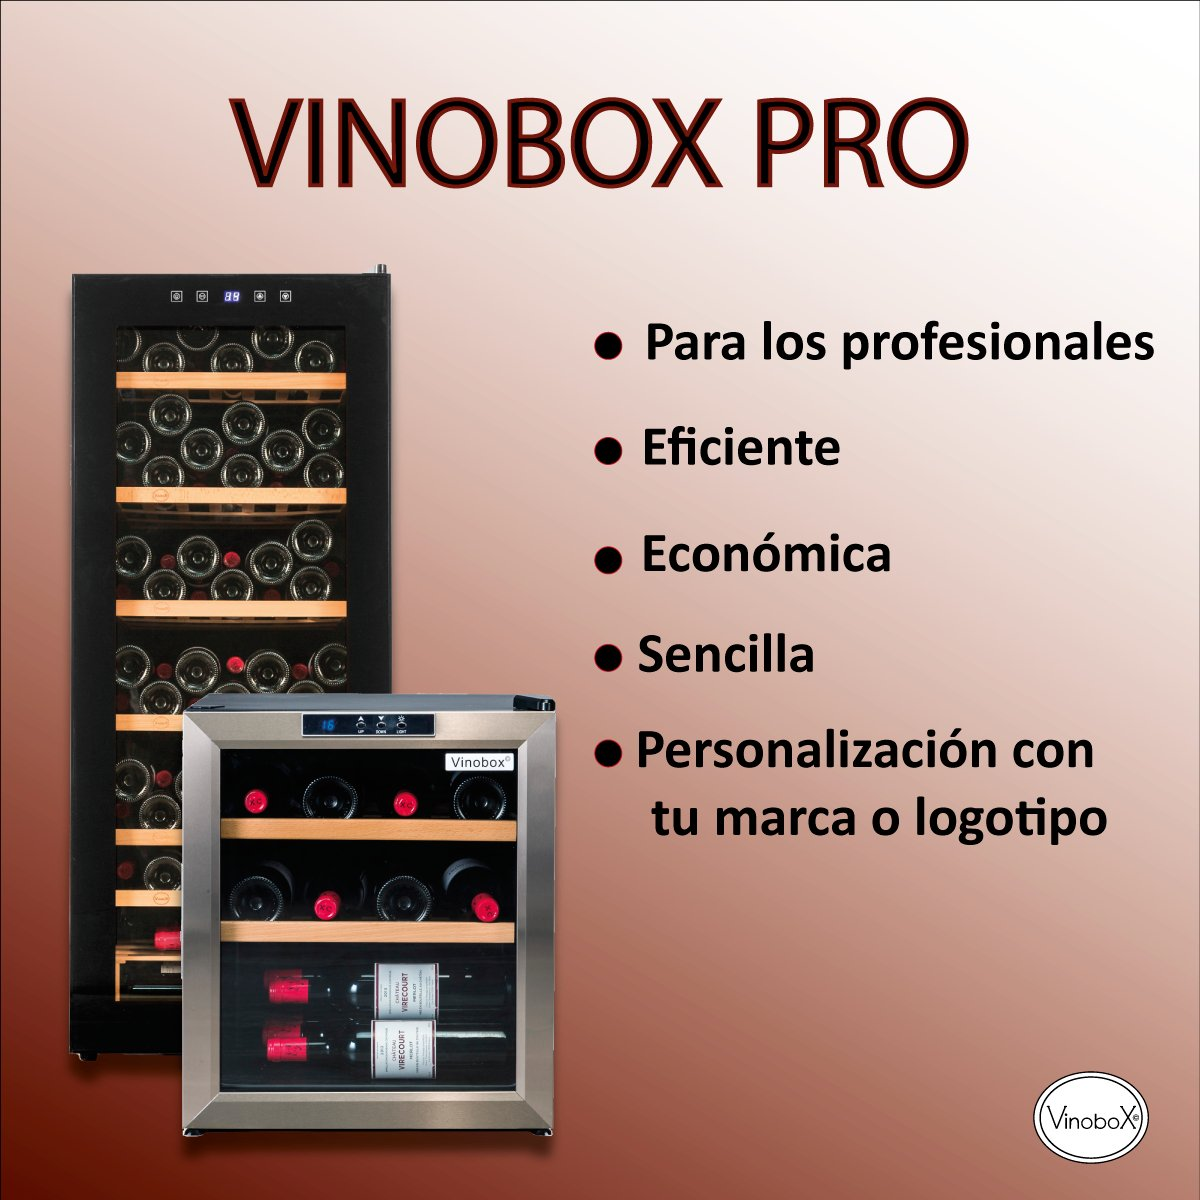 Nuestra Gama Vinobox Pro ✔ Eficiente y económica. 🔝 https://t.co/h7GuDfa4TM #wine #redwine #winetasting #cata #catavinos #winery #winetime #winelover #winelovers #instawine #wineoftheday #foodandwine #wineandfood #wineinstagram #wineigers #vinoteca #vinobox #wineconservation https://t.co/QUyyyIOvFC